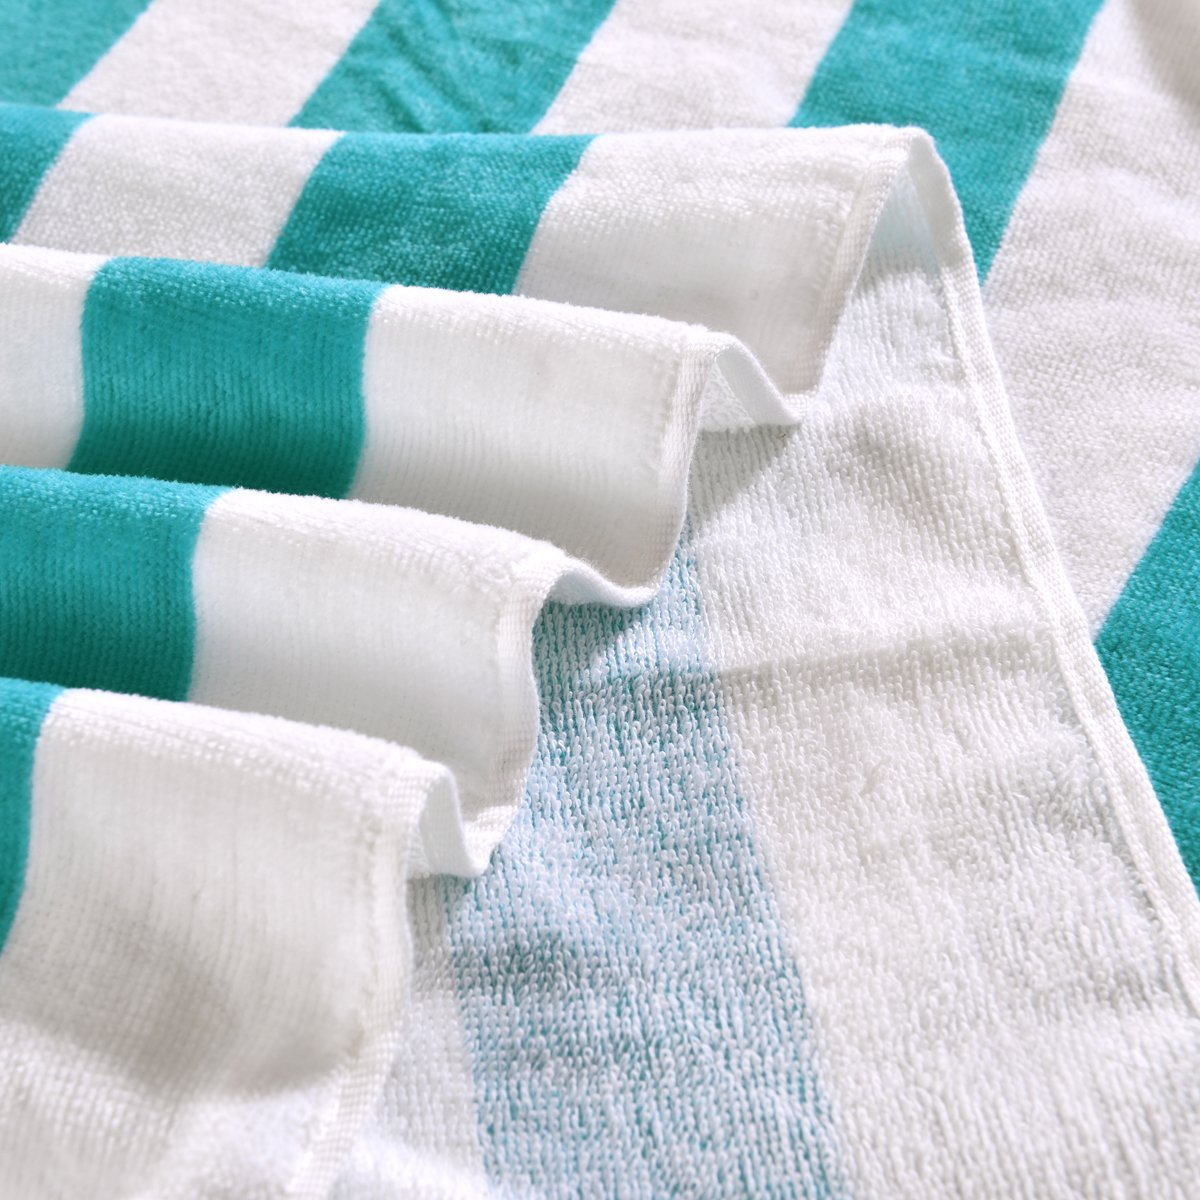 100% Cotton Cabana Striped Beach Towel Caribbean Blue and White (30\